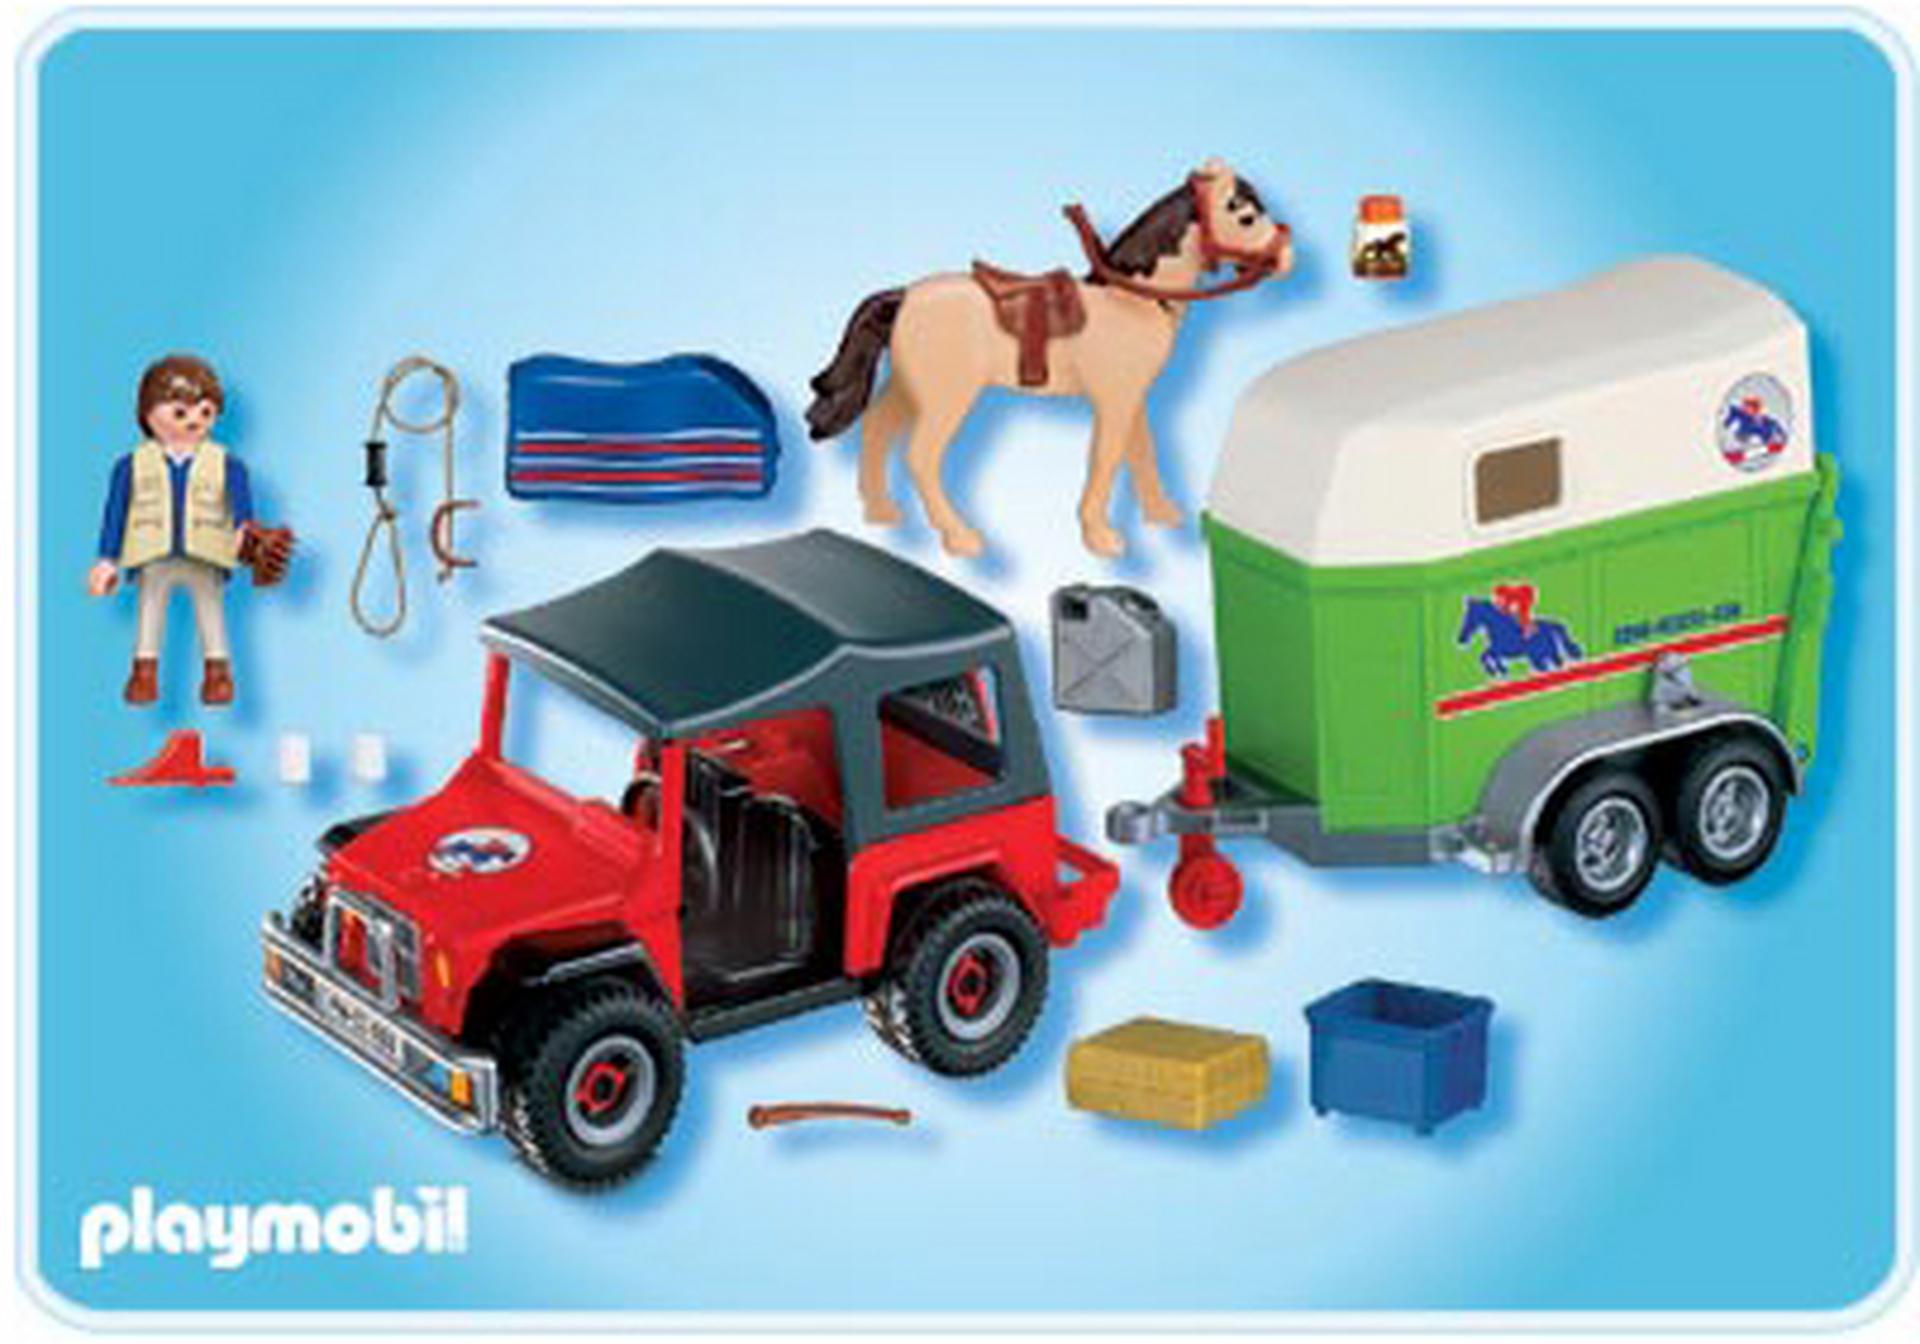 gel ndewagen mit pferdeanh nger 4189 a playmobil